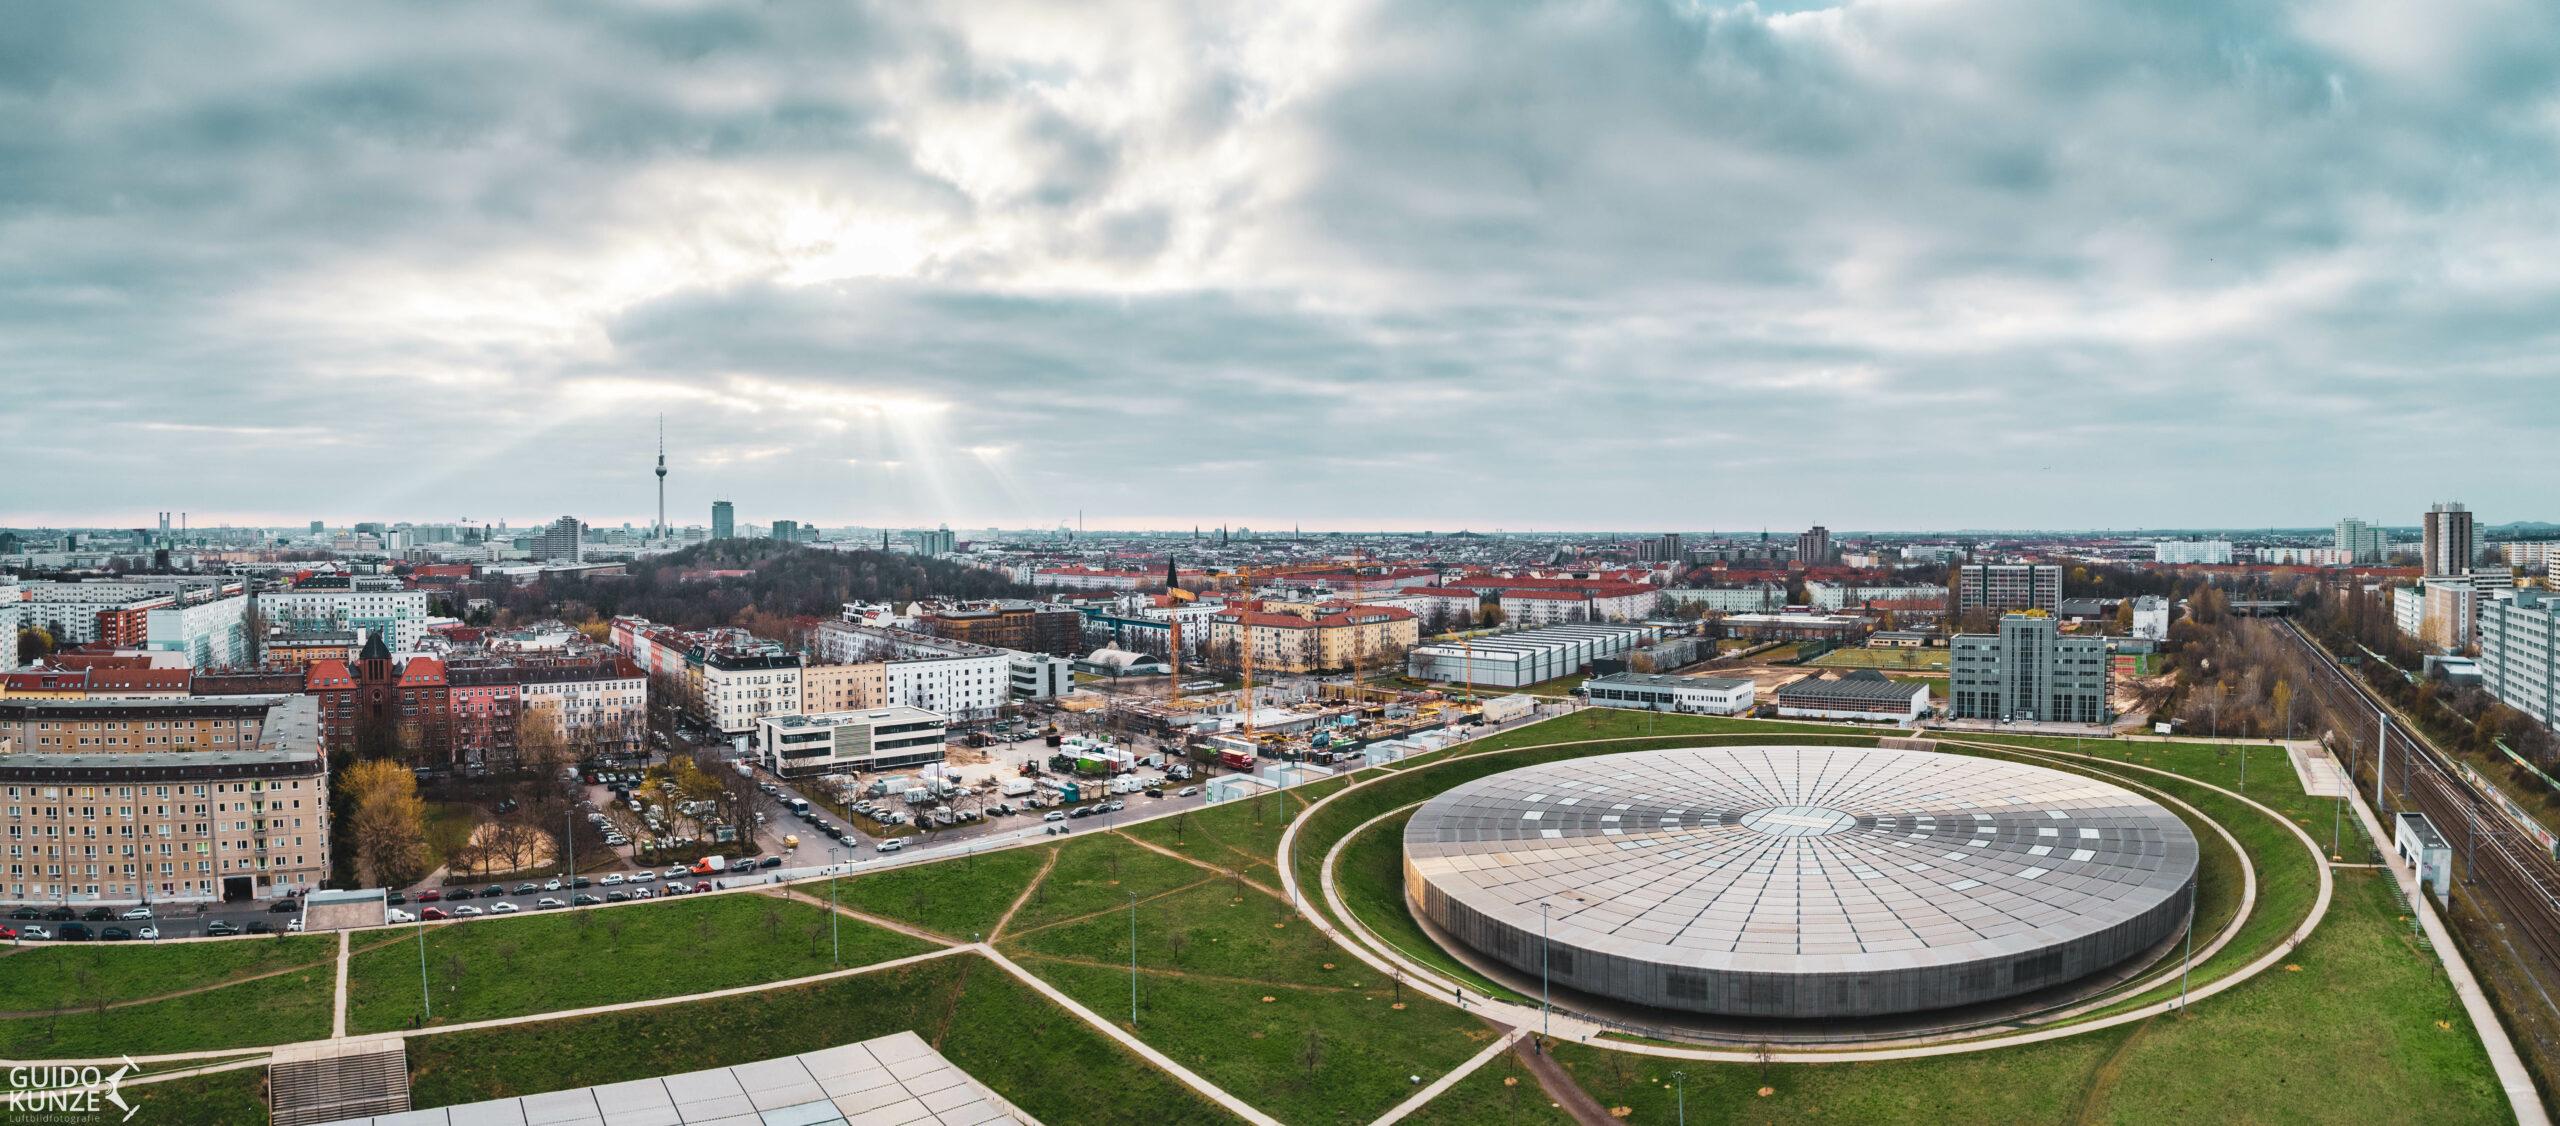 Das Velodrom Berlin